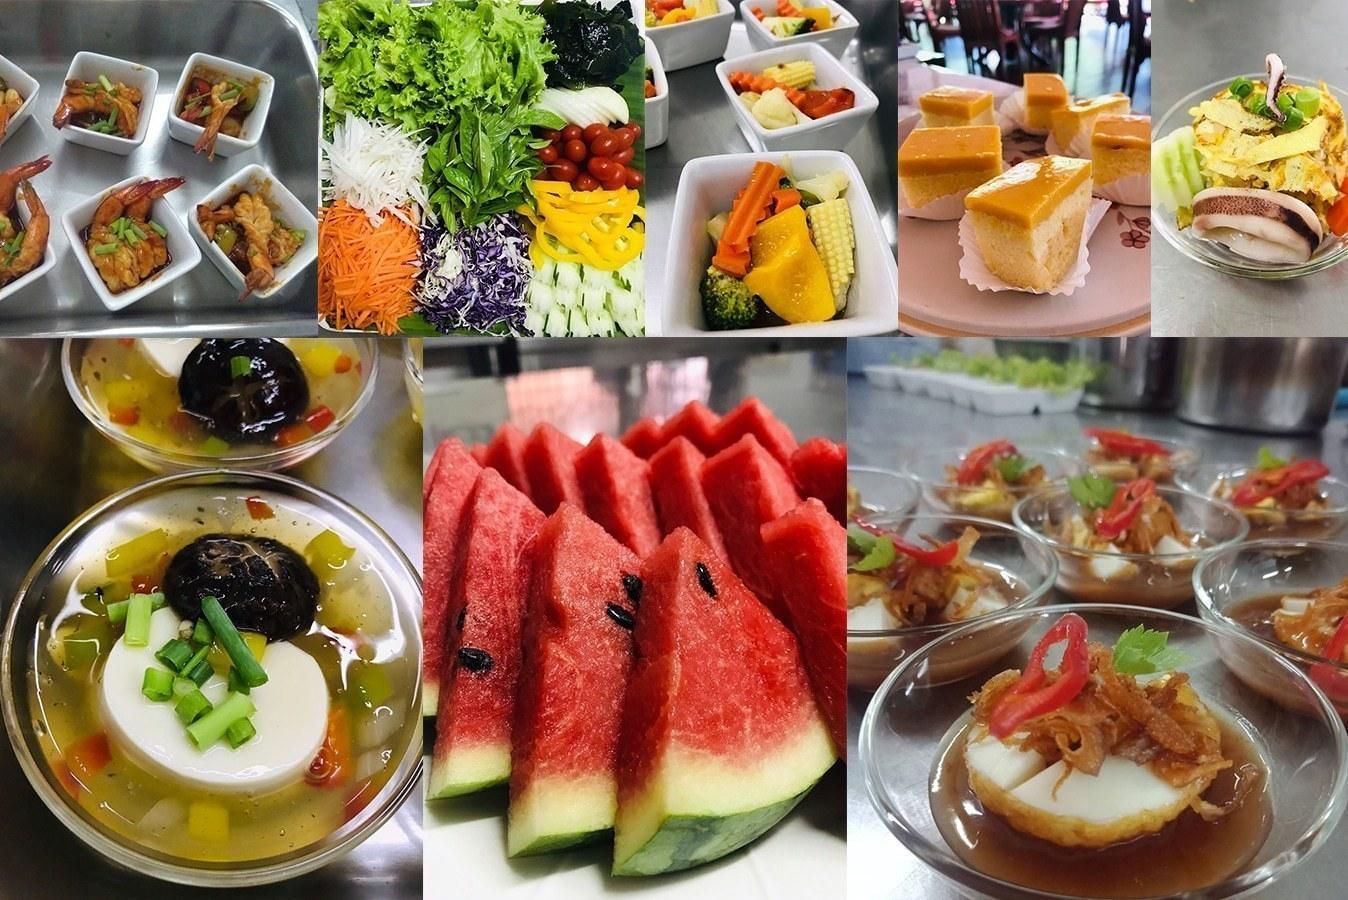 Tao Garden Health Resort and Spa – Breakfast, Lunch, Dinner